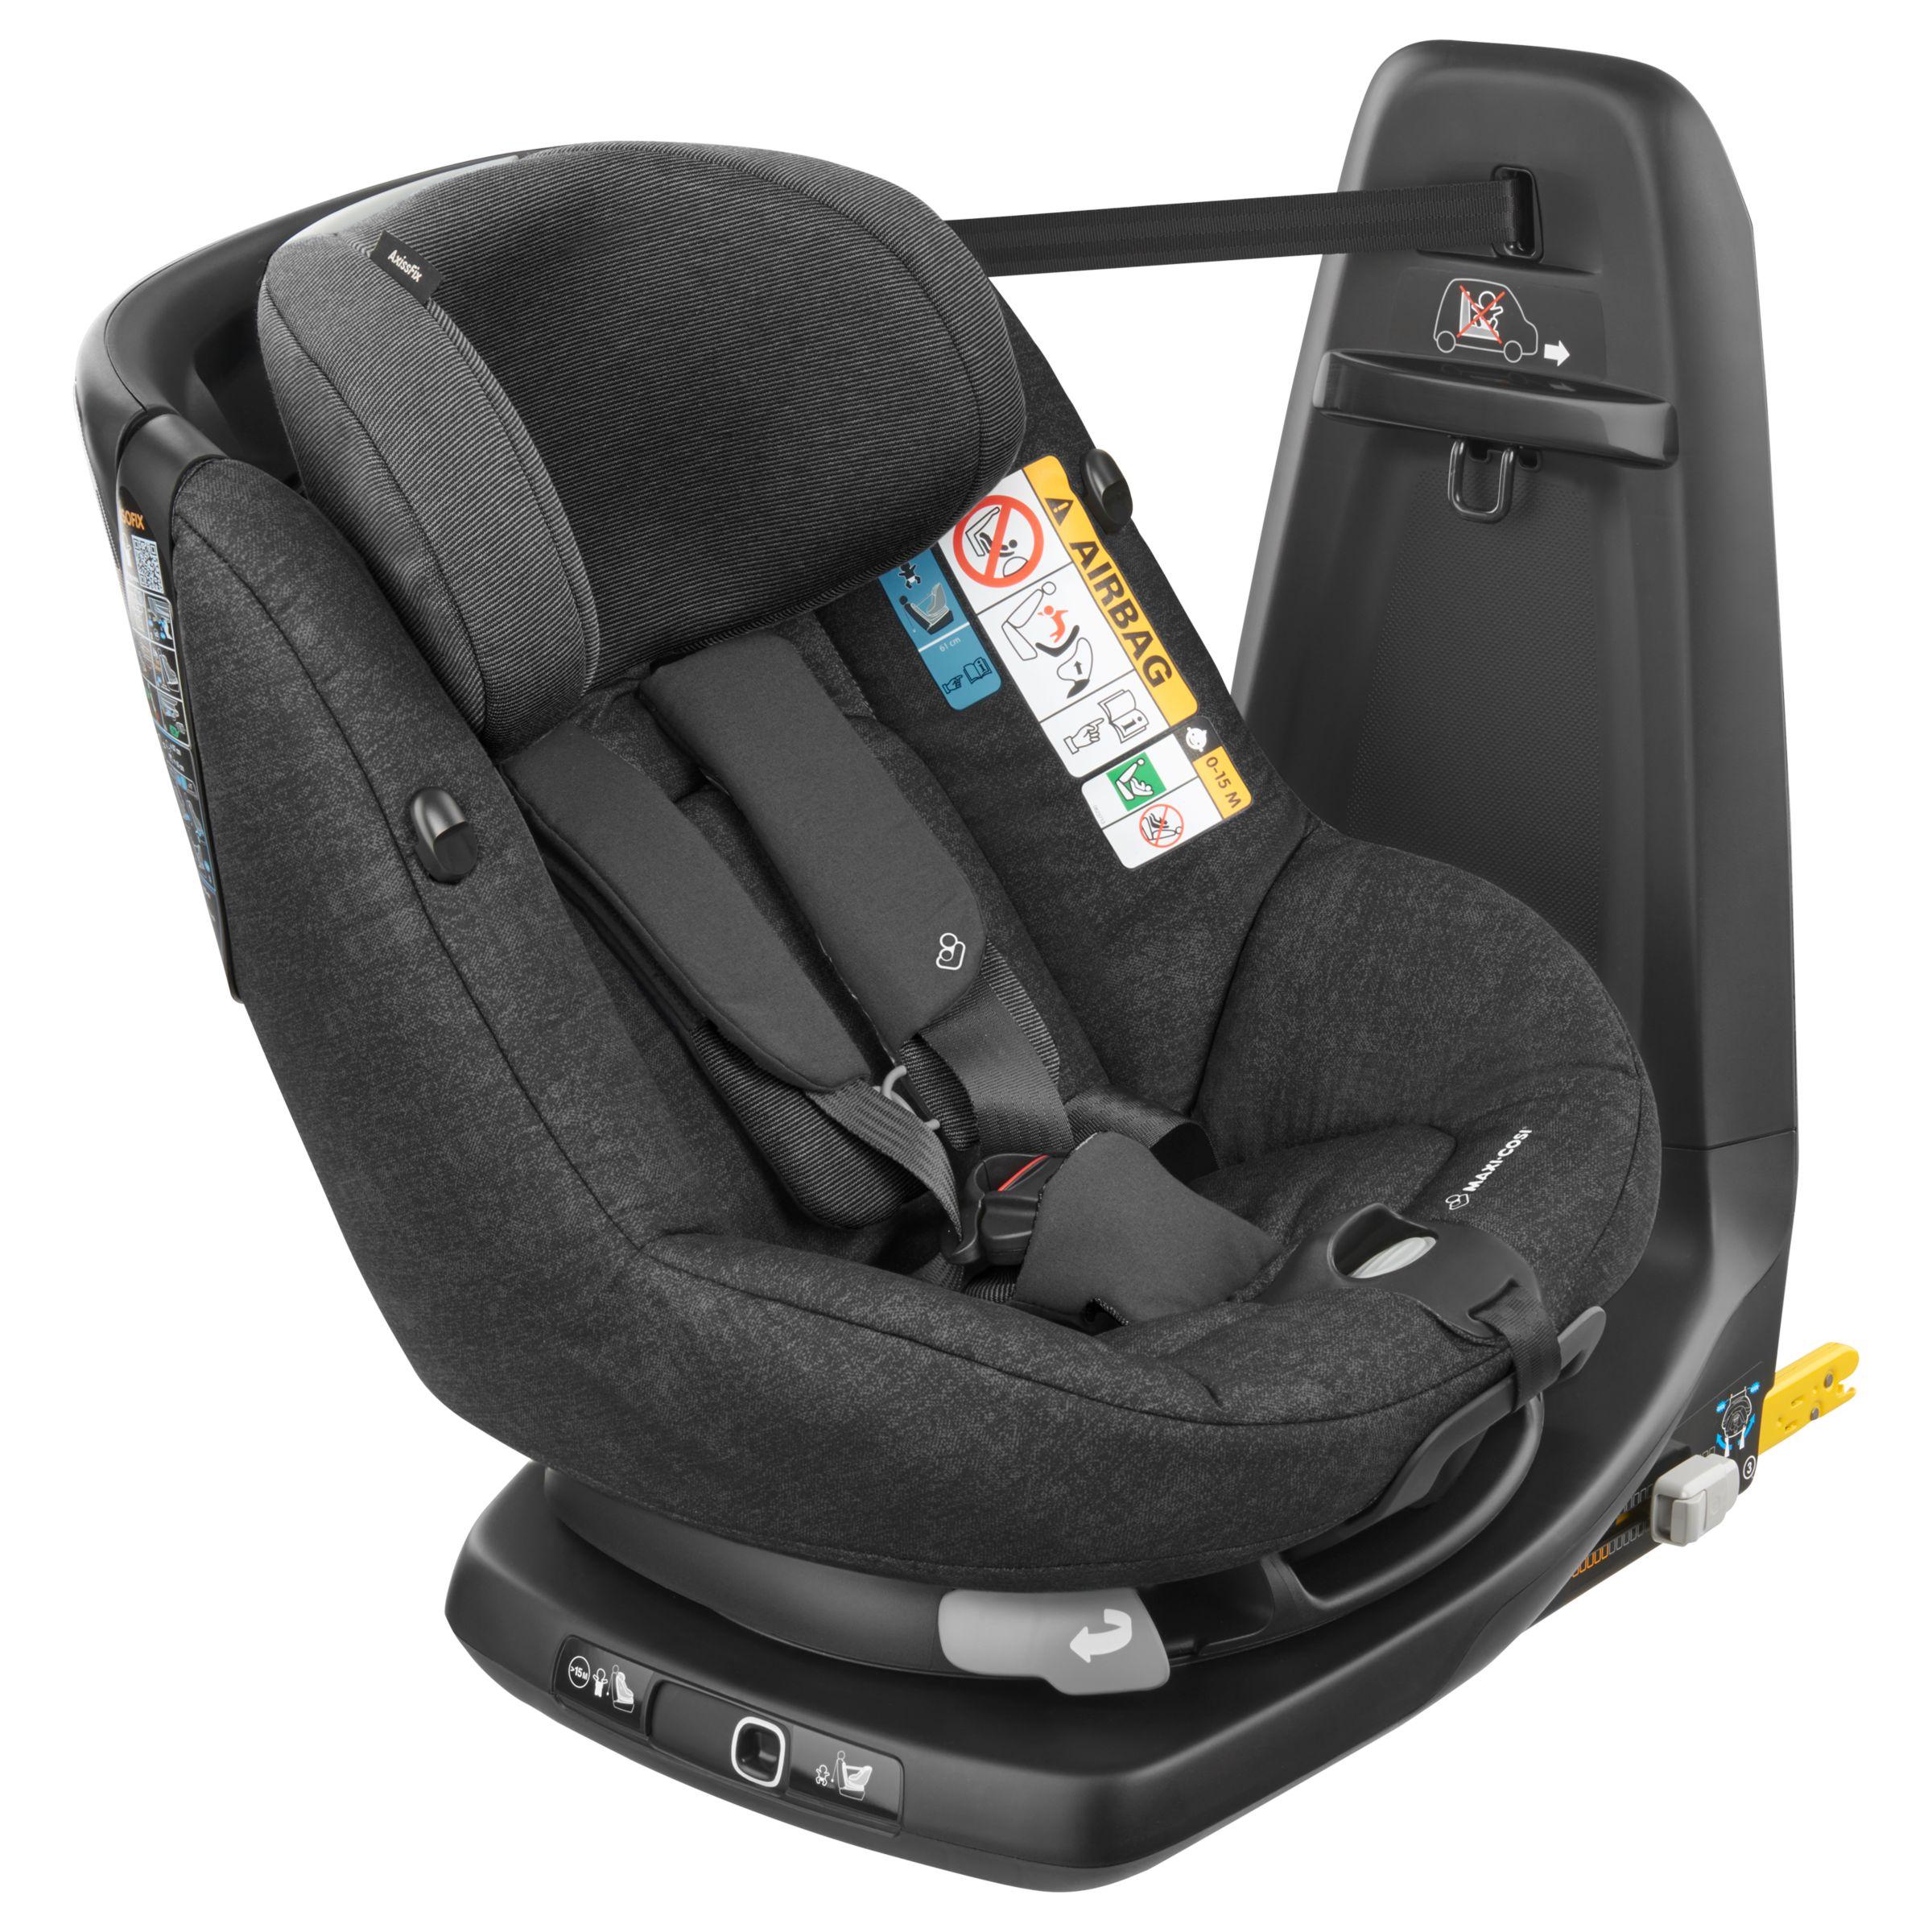 2fa00576be6 Maxi-Cosi AxissFix Group 1 i-Size Car Seat, Nomad Black at John Lewis &  Partners